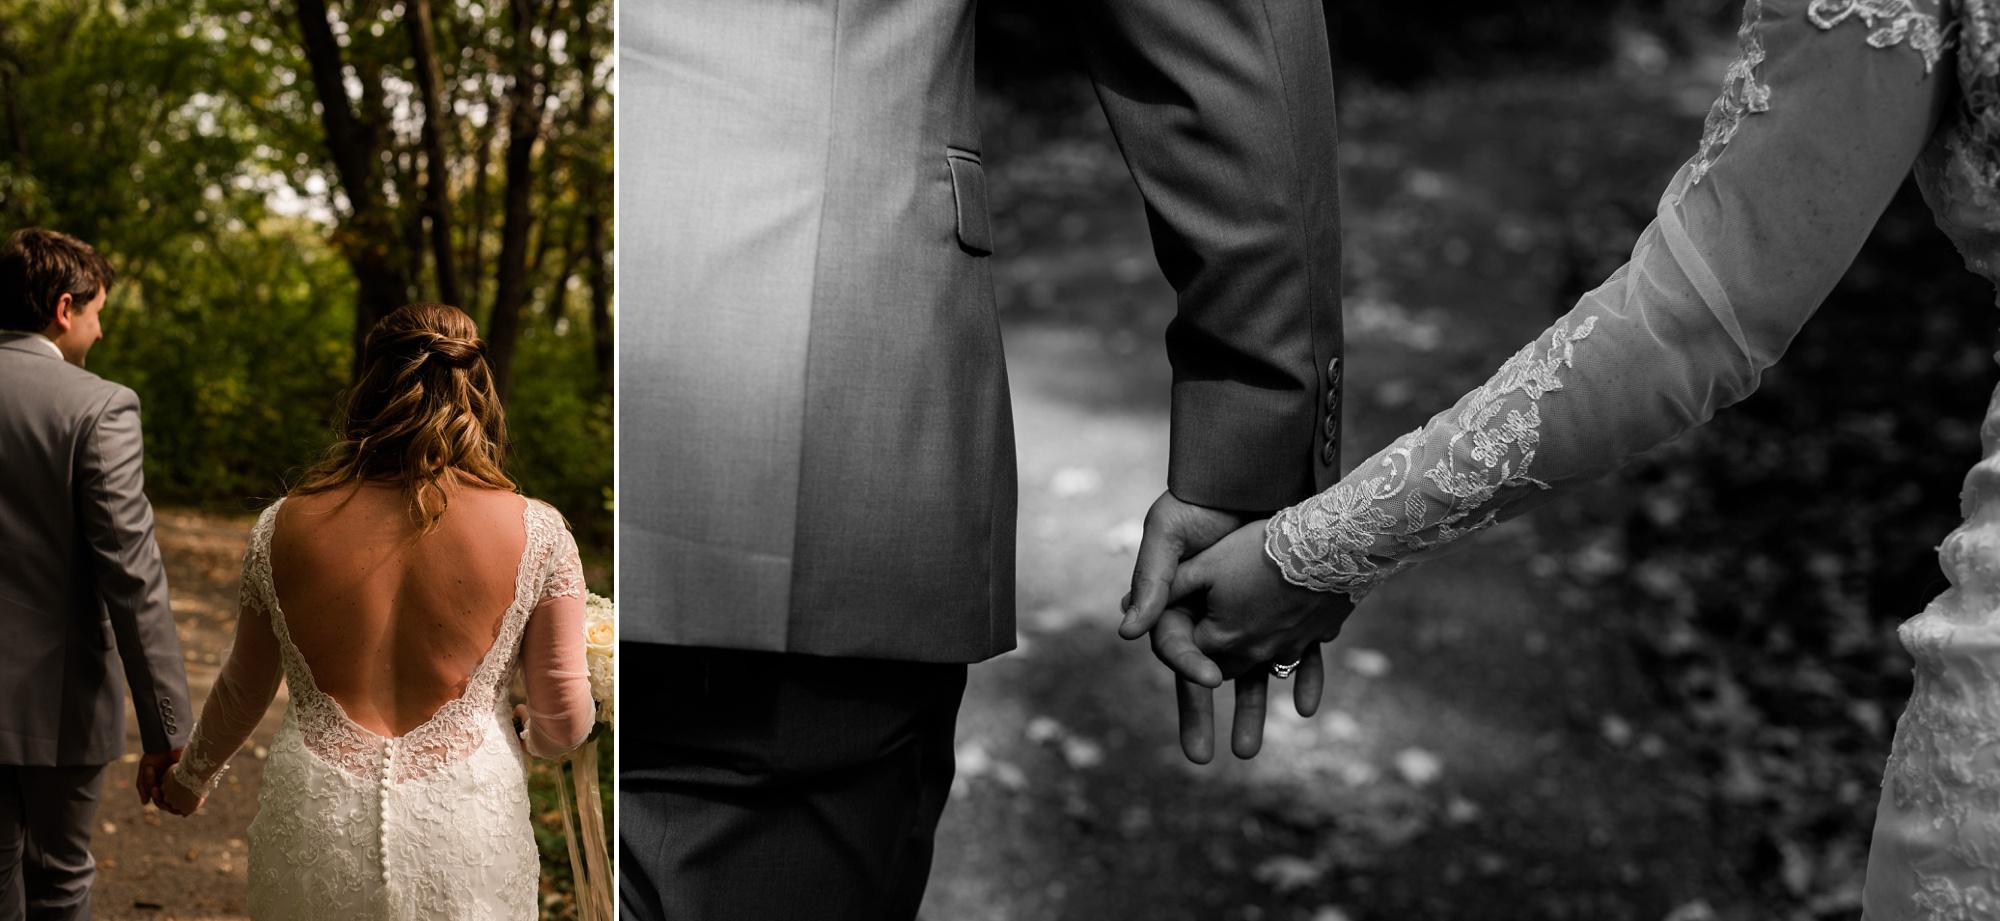 AmberLangerudPhotography_Fair Hills Resort Lakeside Wedding in Minnesota_3431.jpg